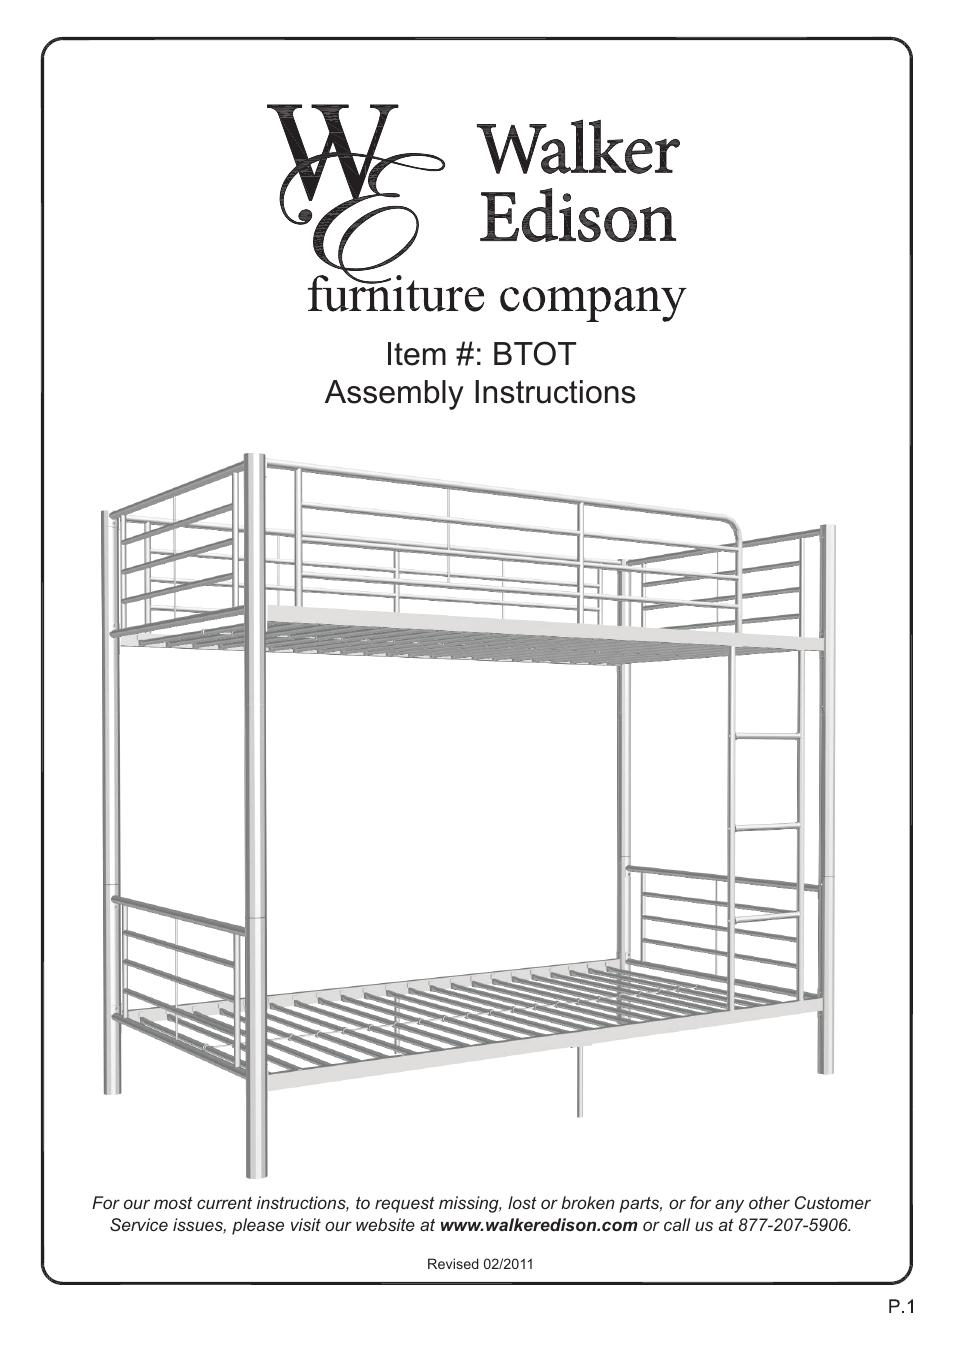 Panasonic Patio Furniture User Manual